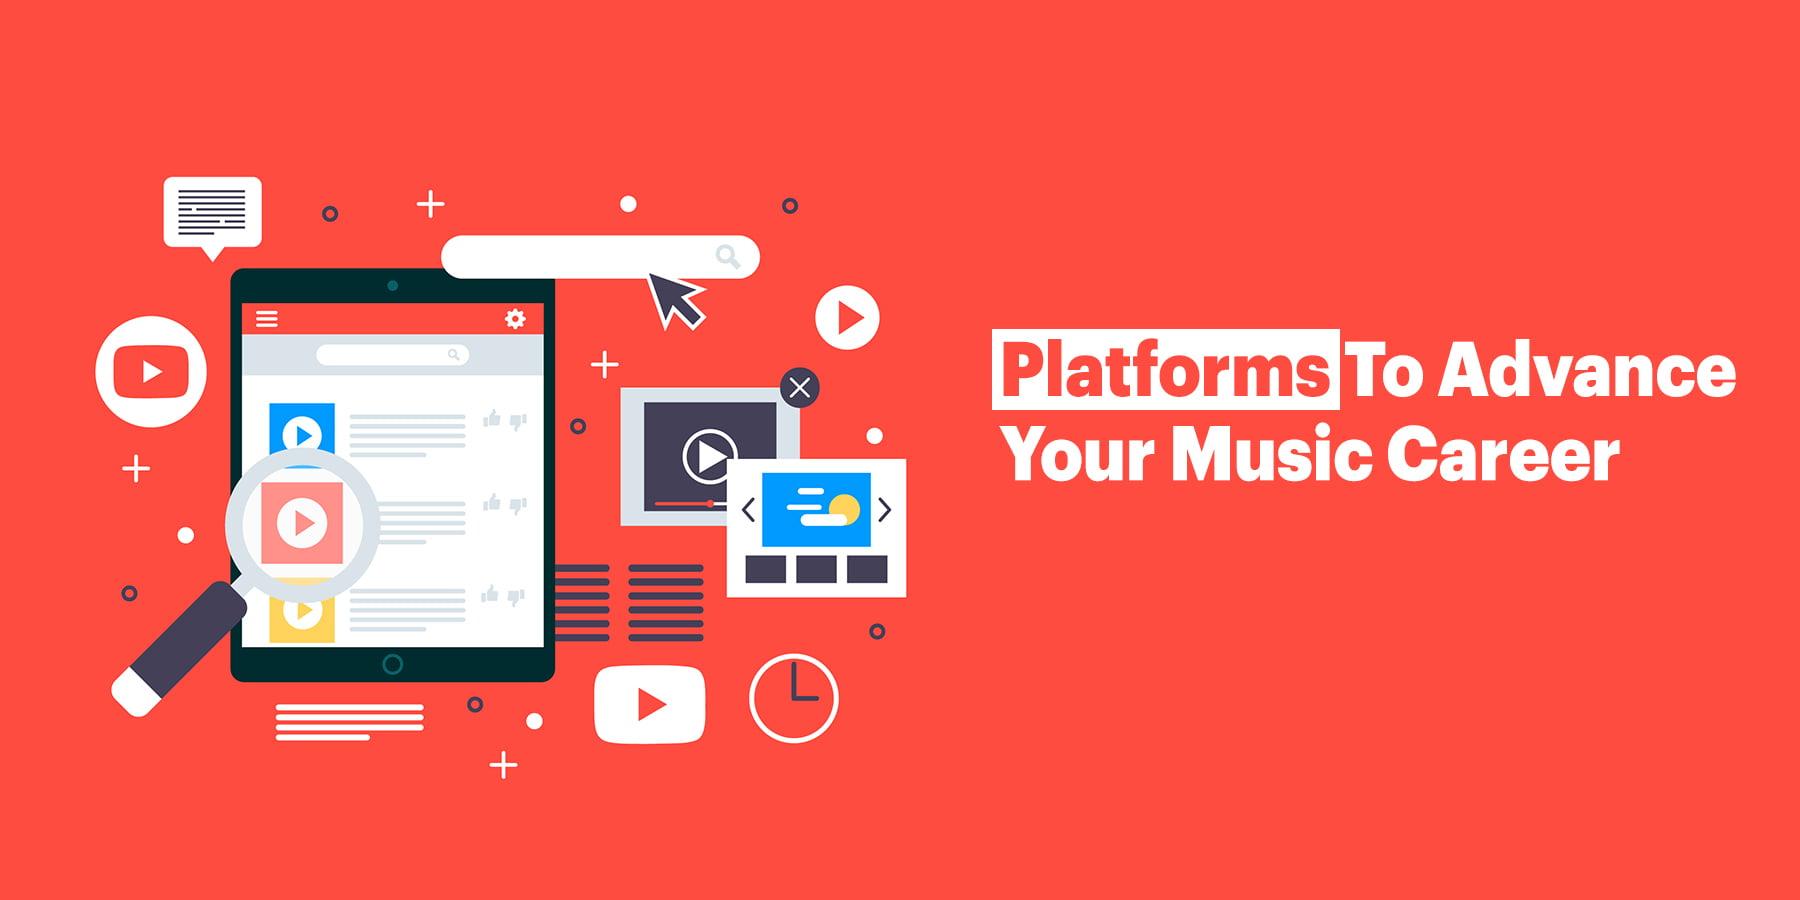 New Music Platforms